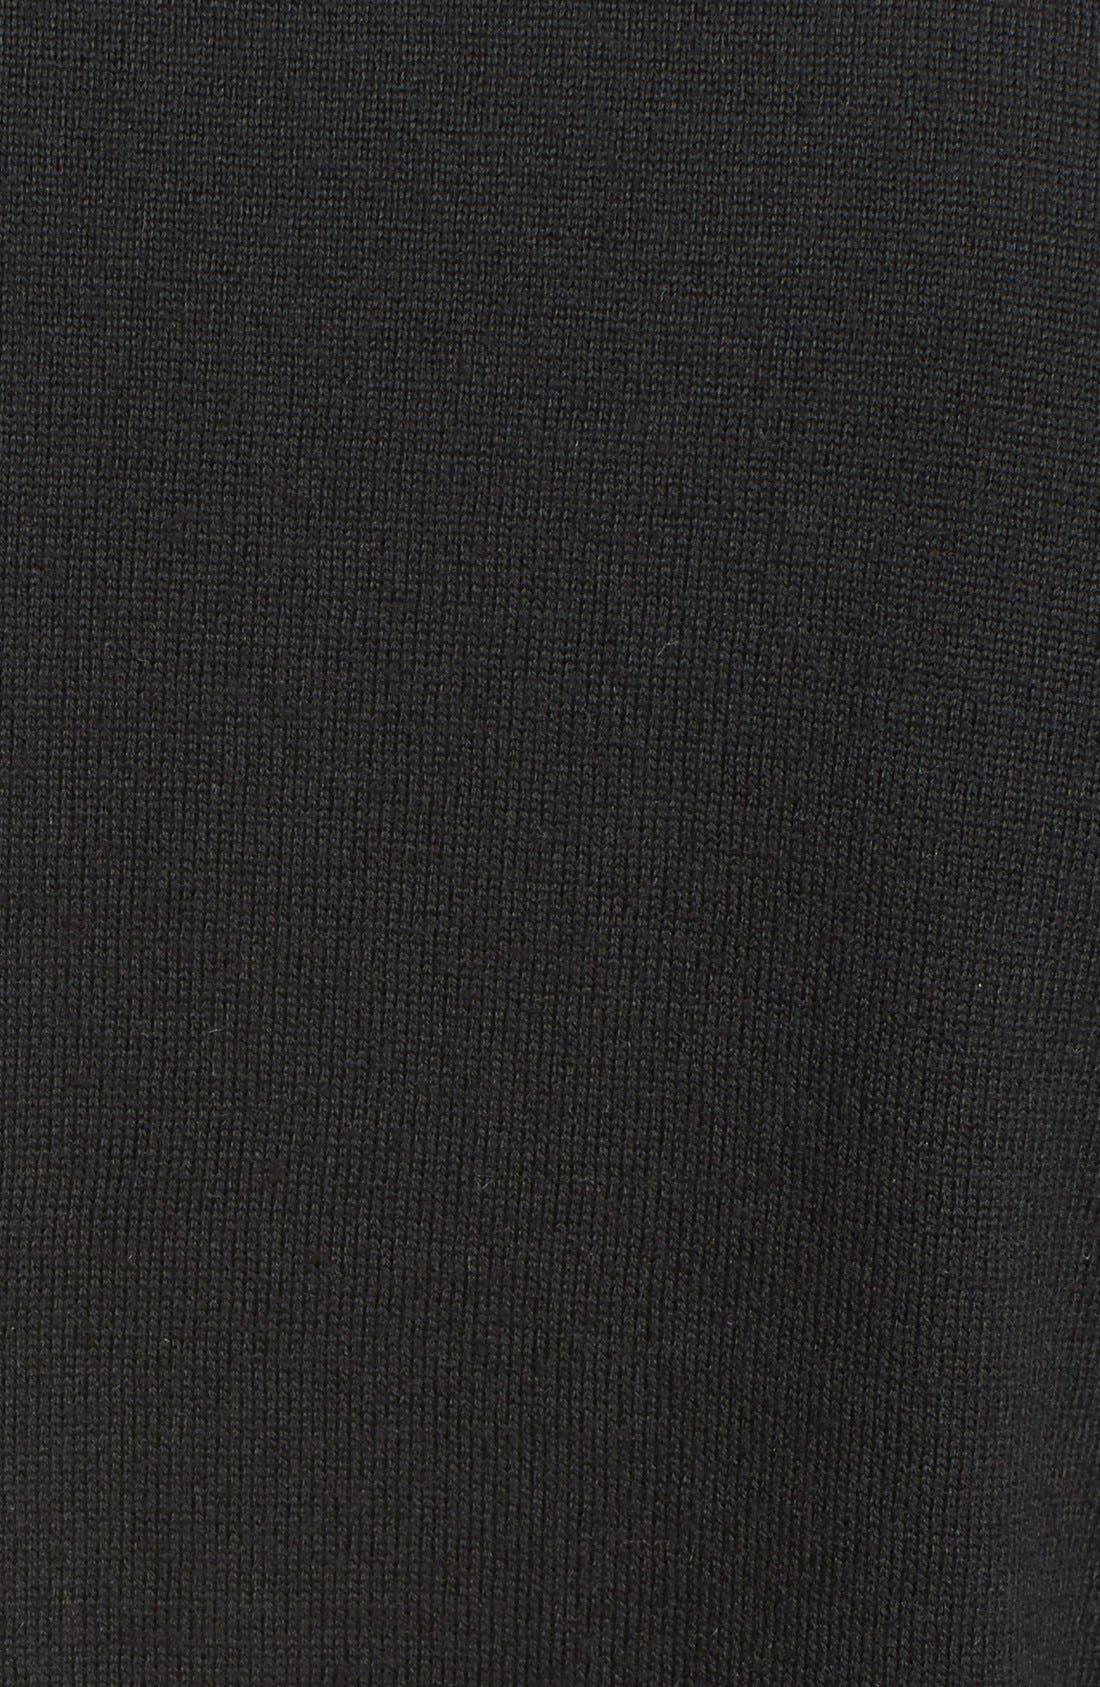 'Kelby' Full Zip Wool Sweater,                             Alternate thumbnail 2, color,                             001